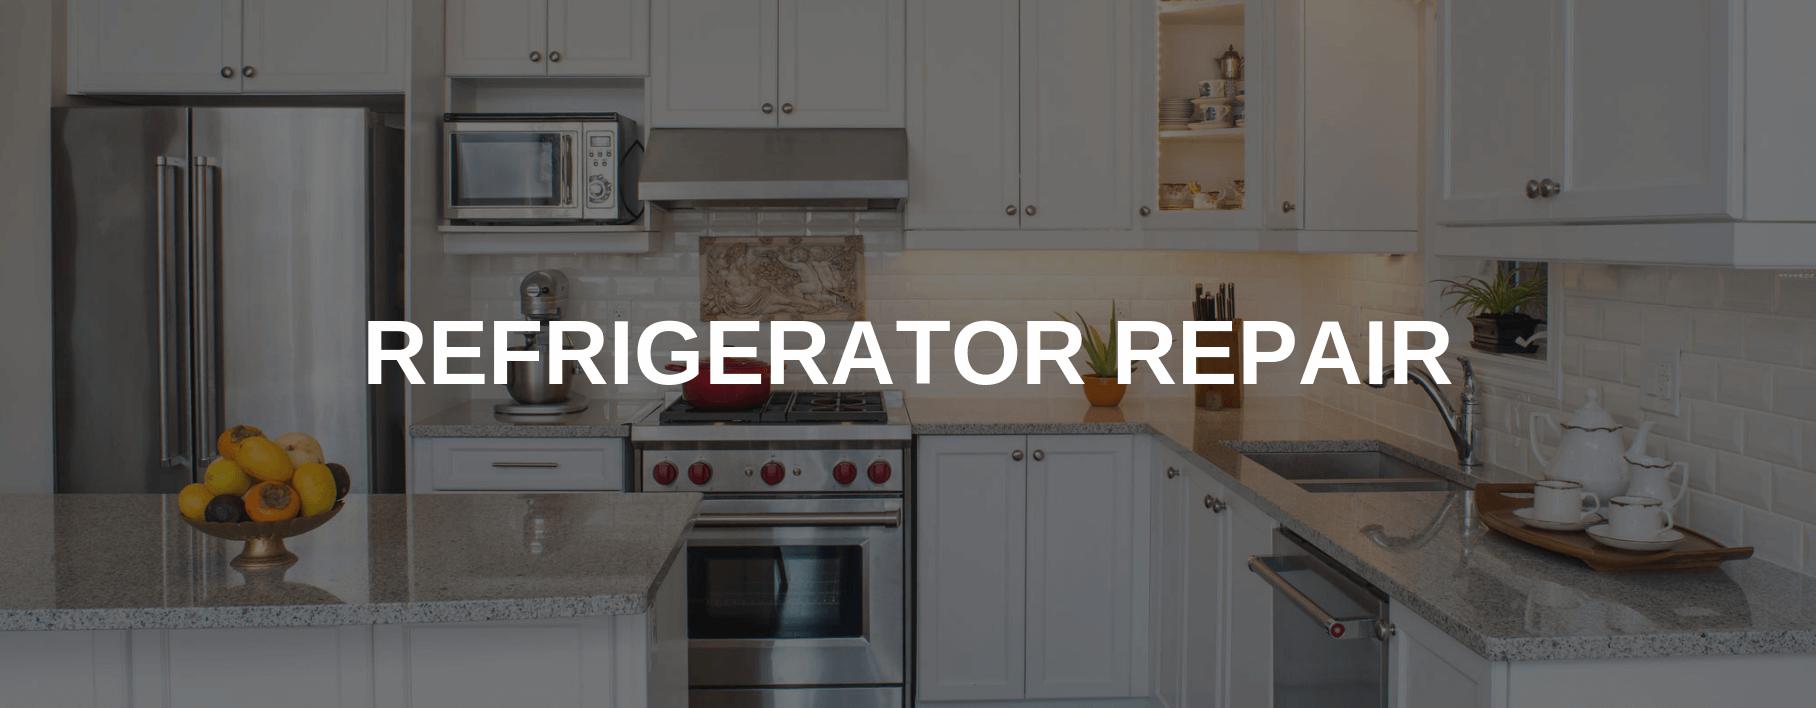 refrigerator repair new brunswick